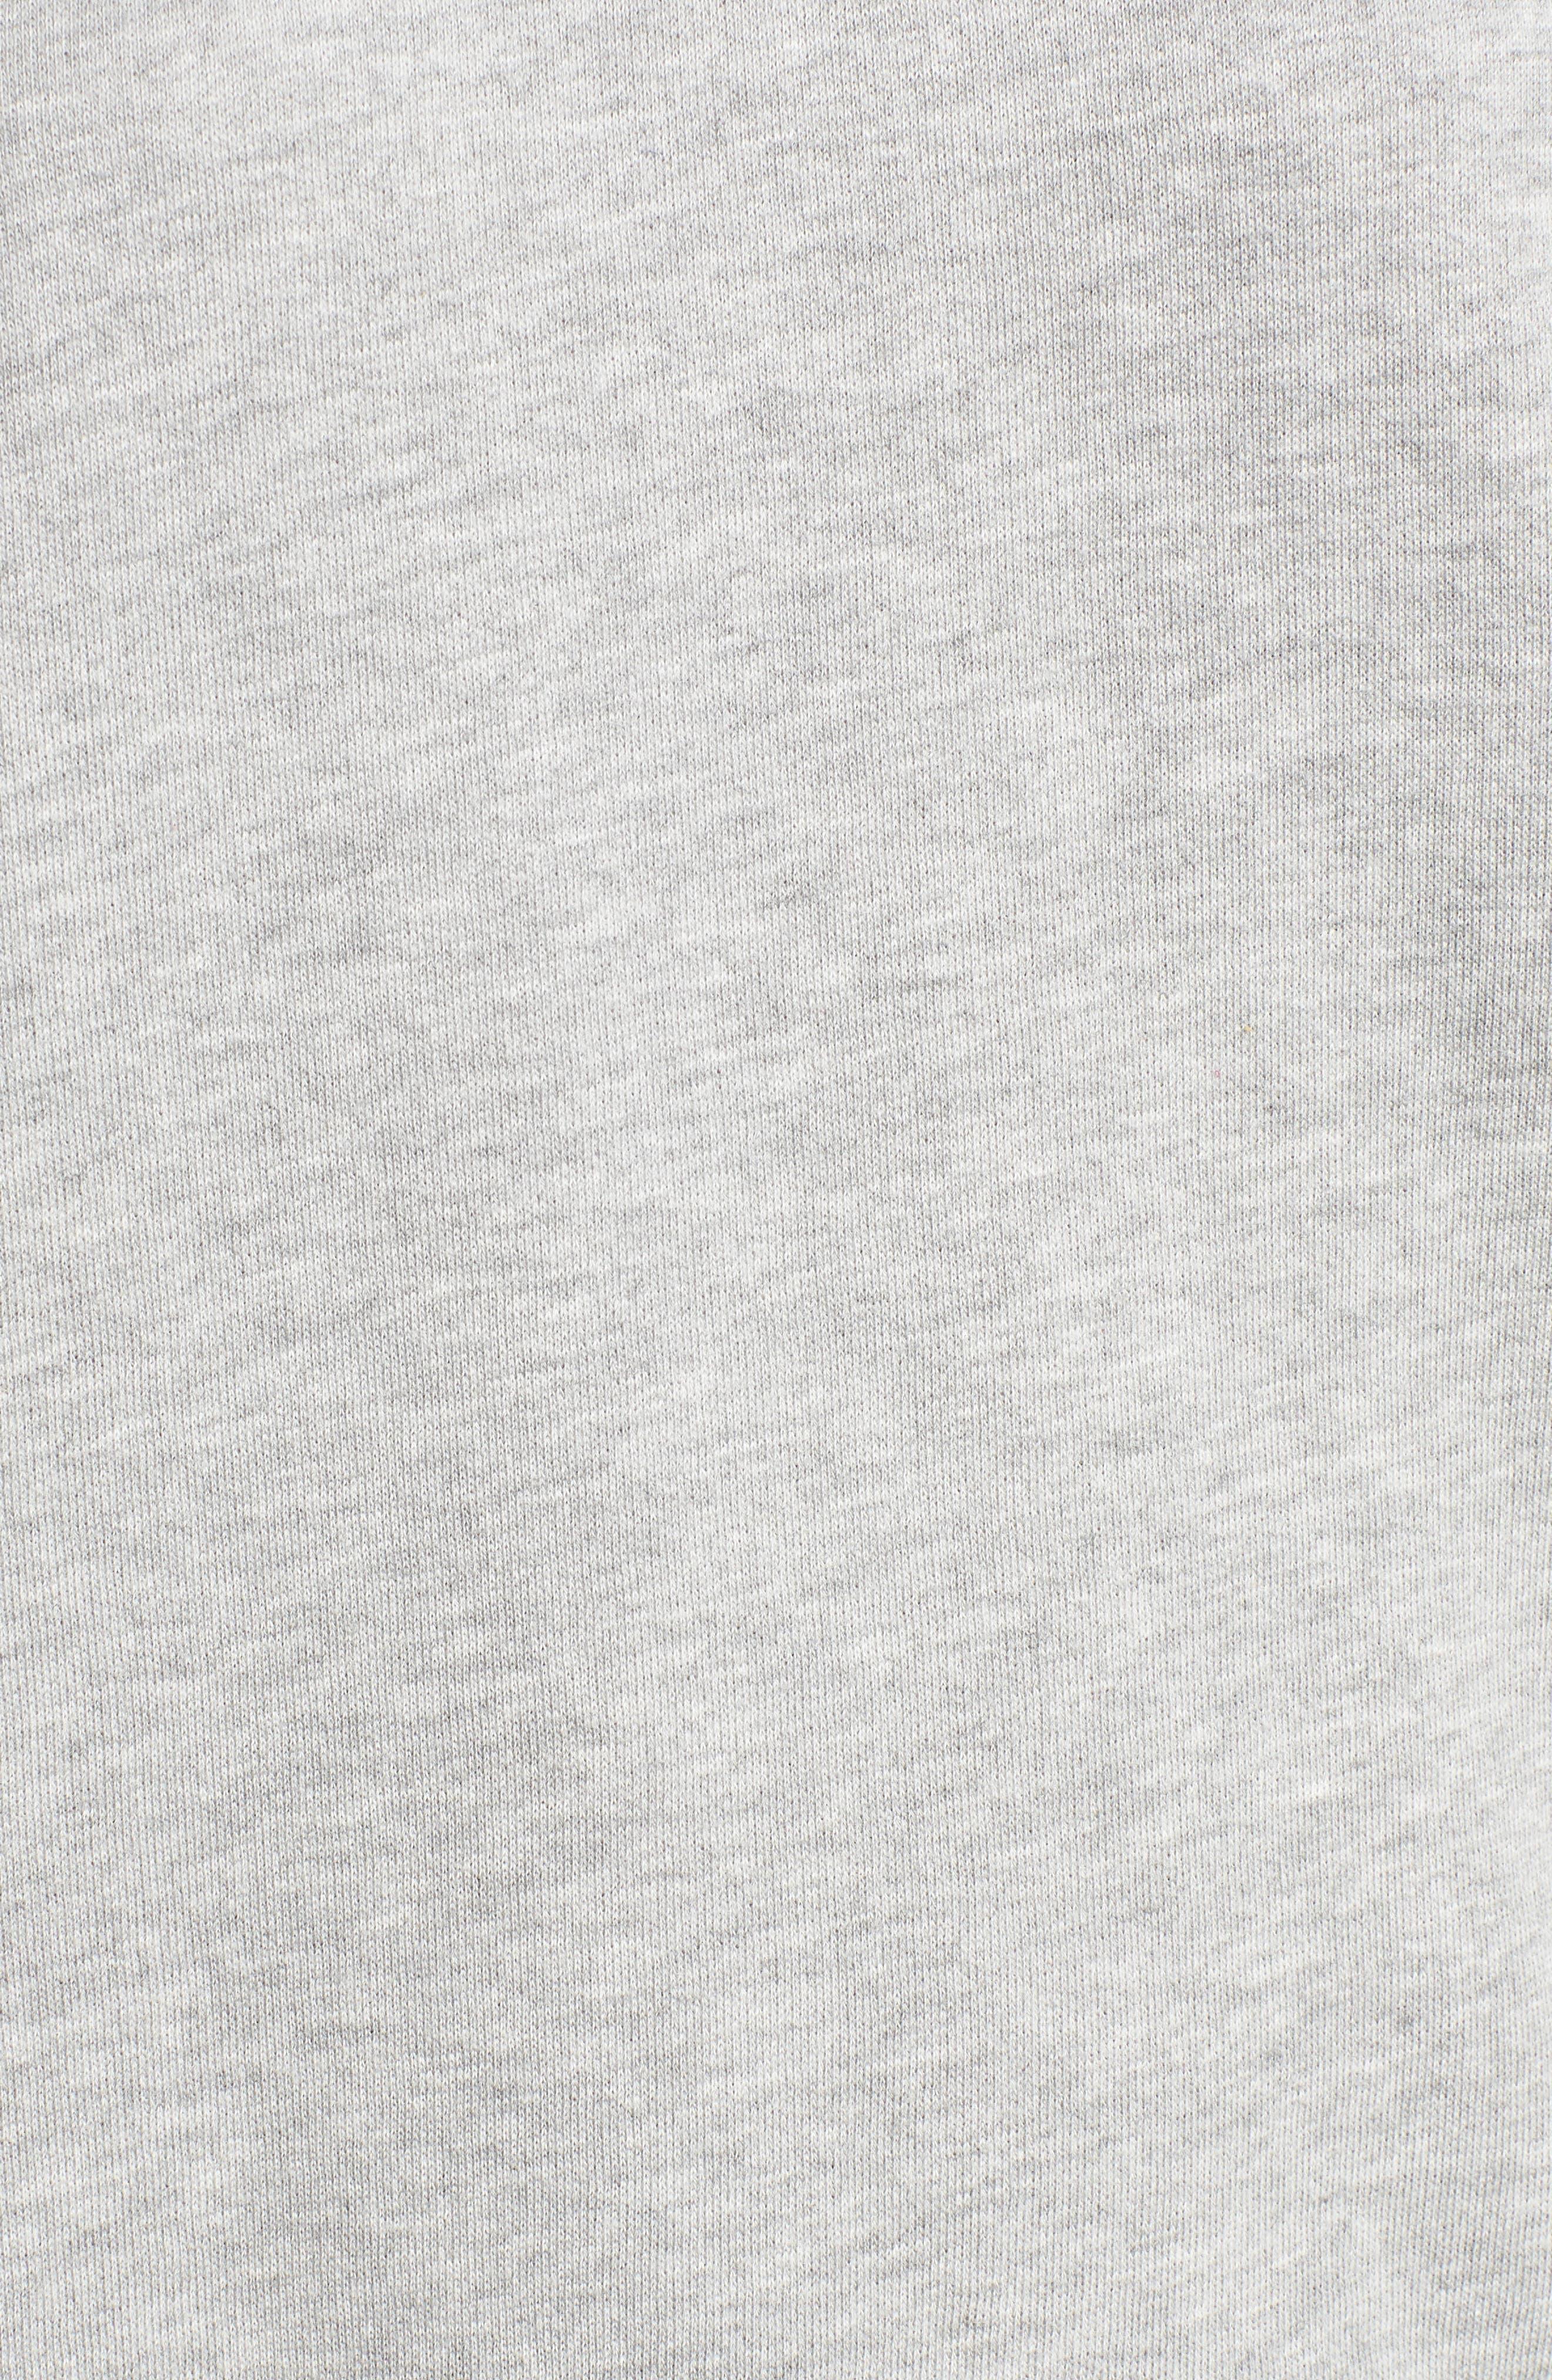 Flannel Sleeve Sweatshirt,                             Alternate thumbnail 5, color,                             030